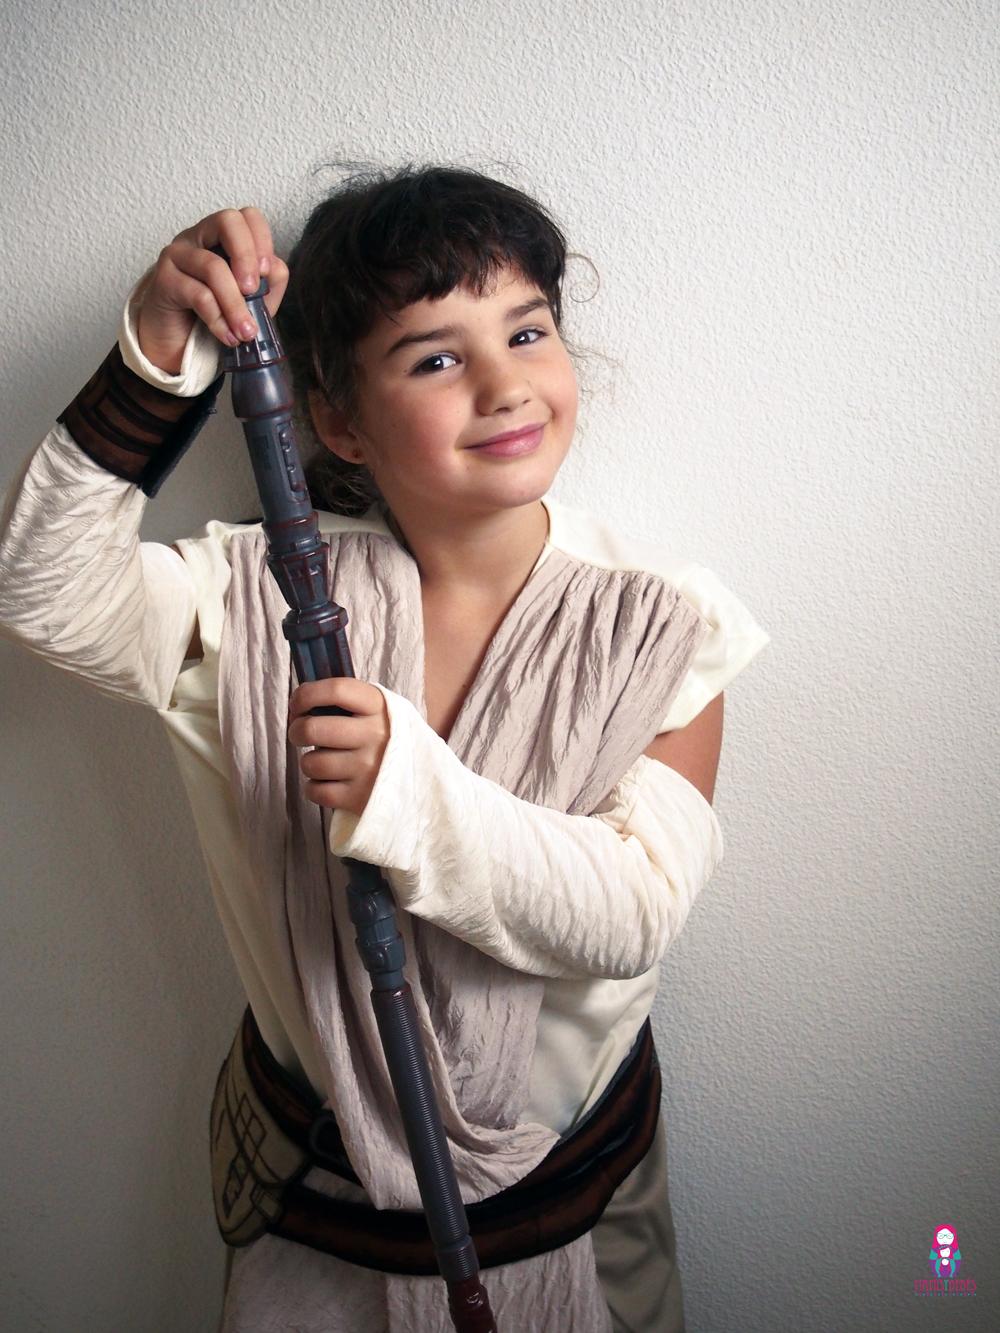 disfraz infantil de Star Wars Rey